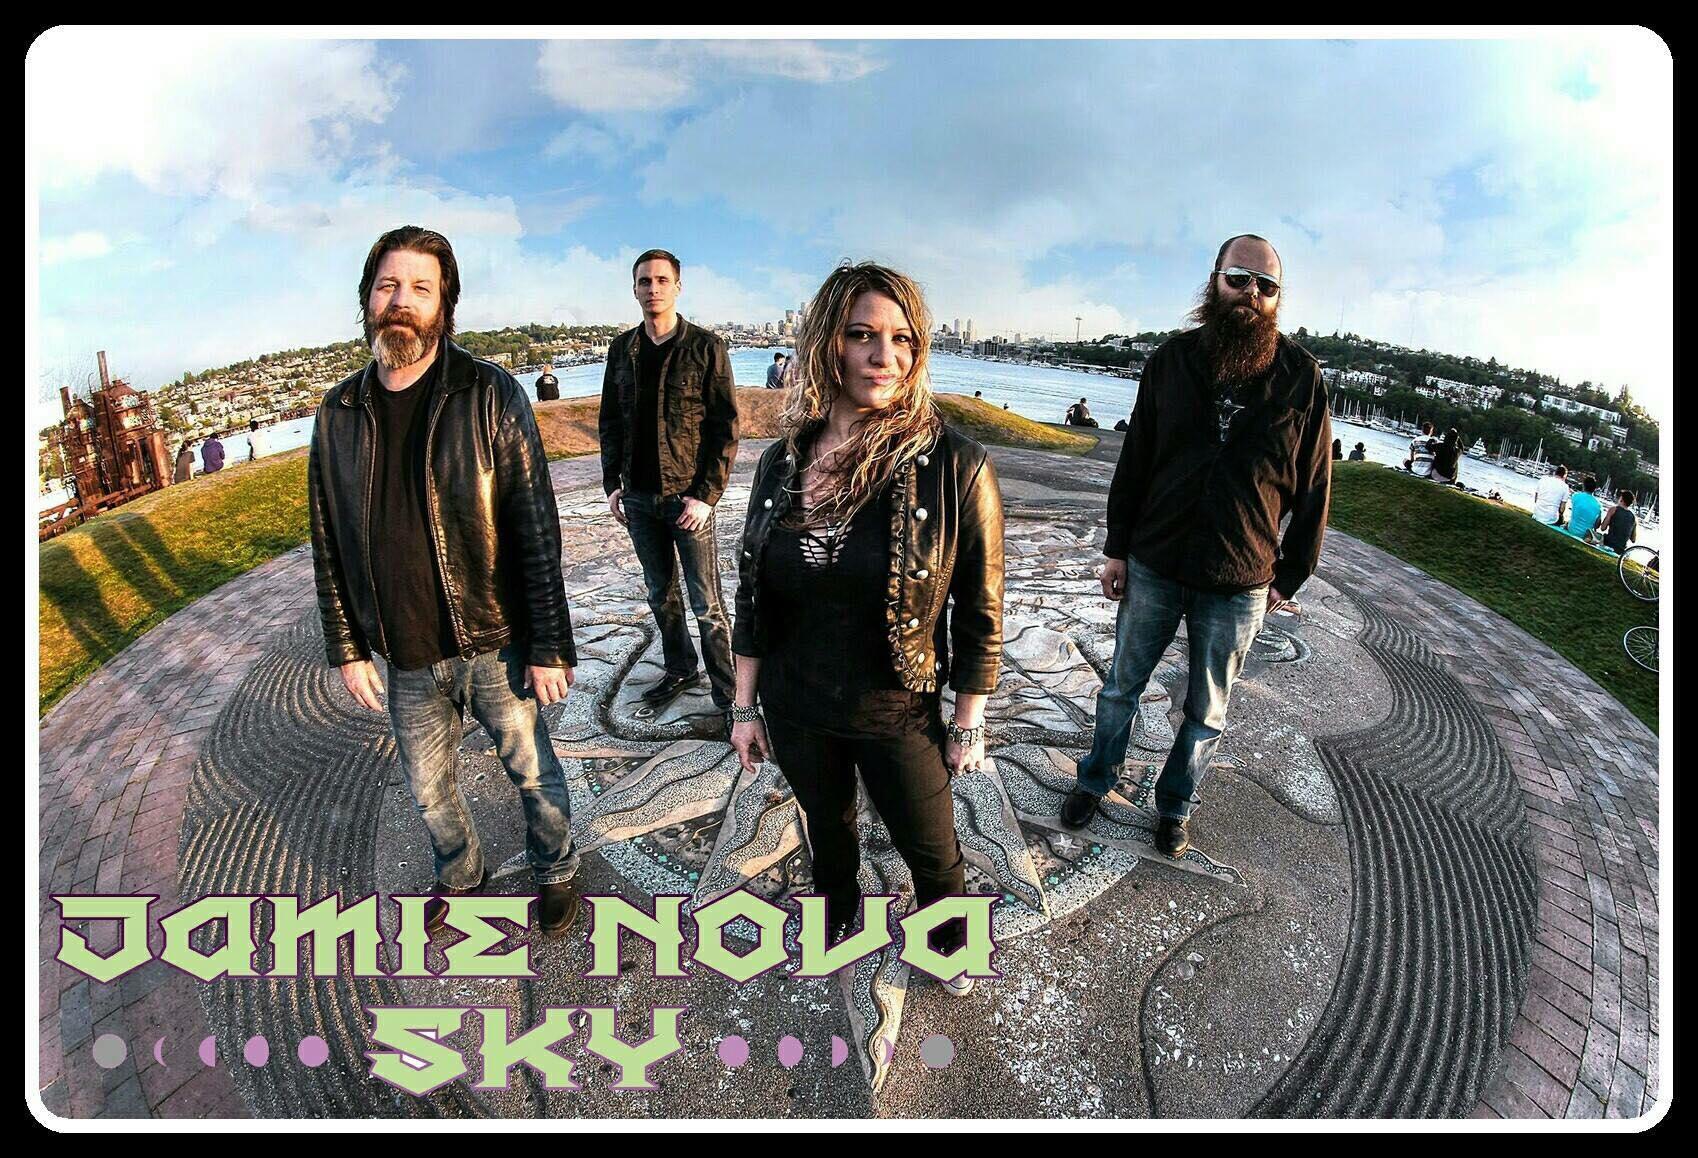 Jamie Nova Sky.jpg